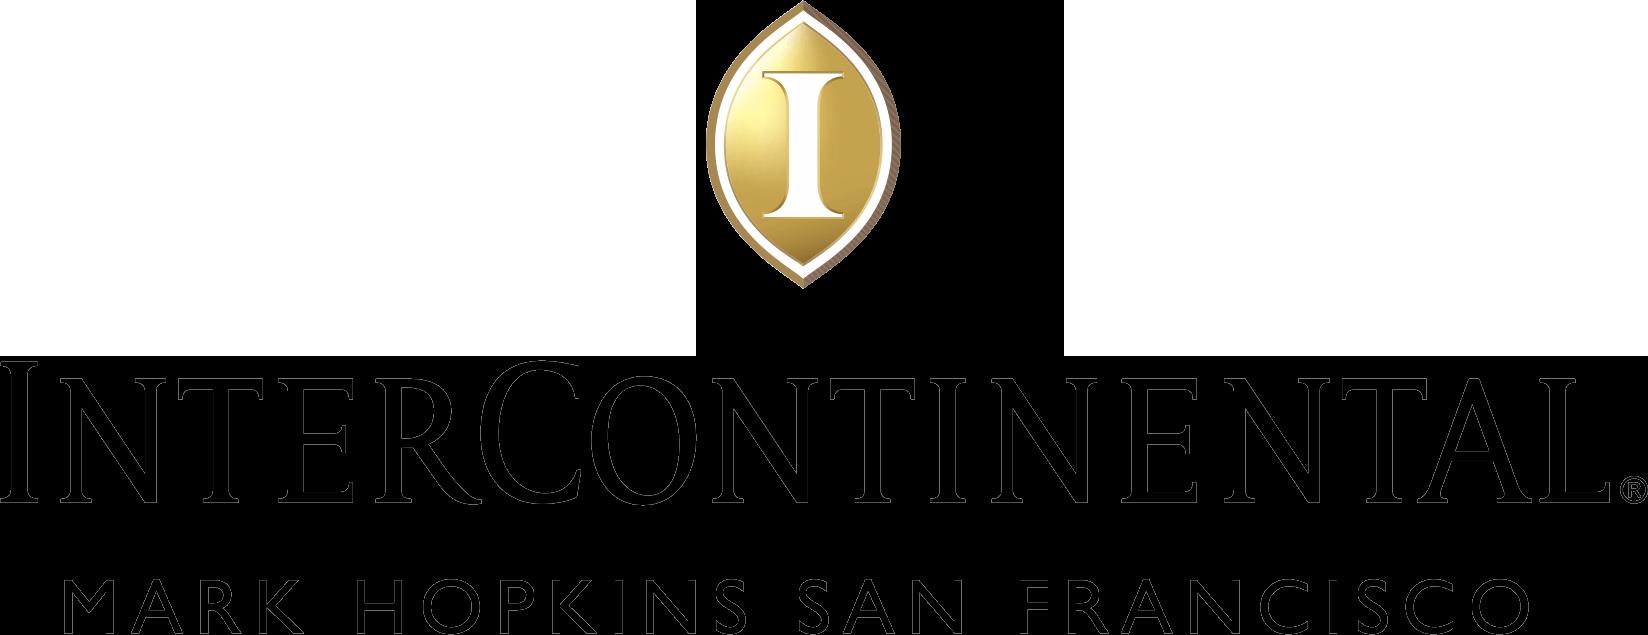 Logo Intercontinental Mark Hopkins san Francisco horizontal